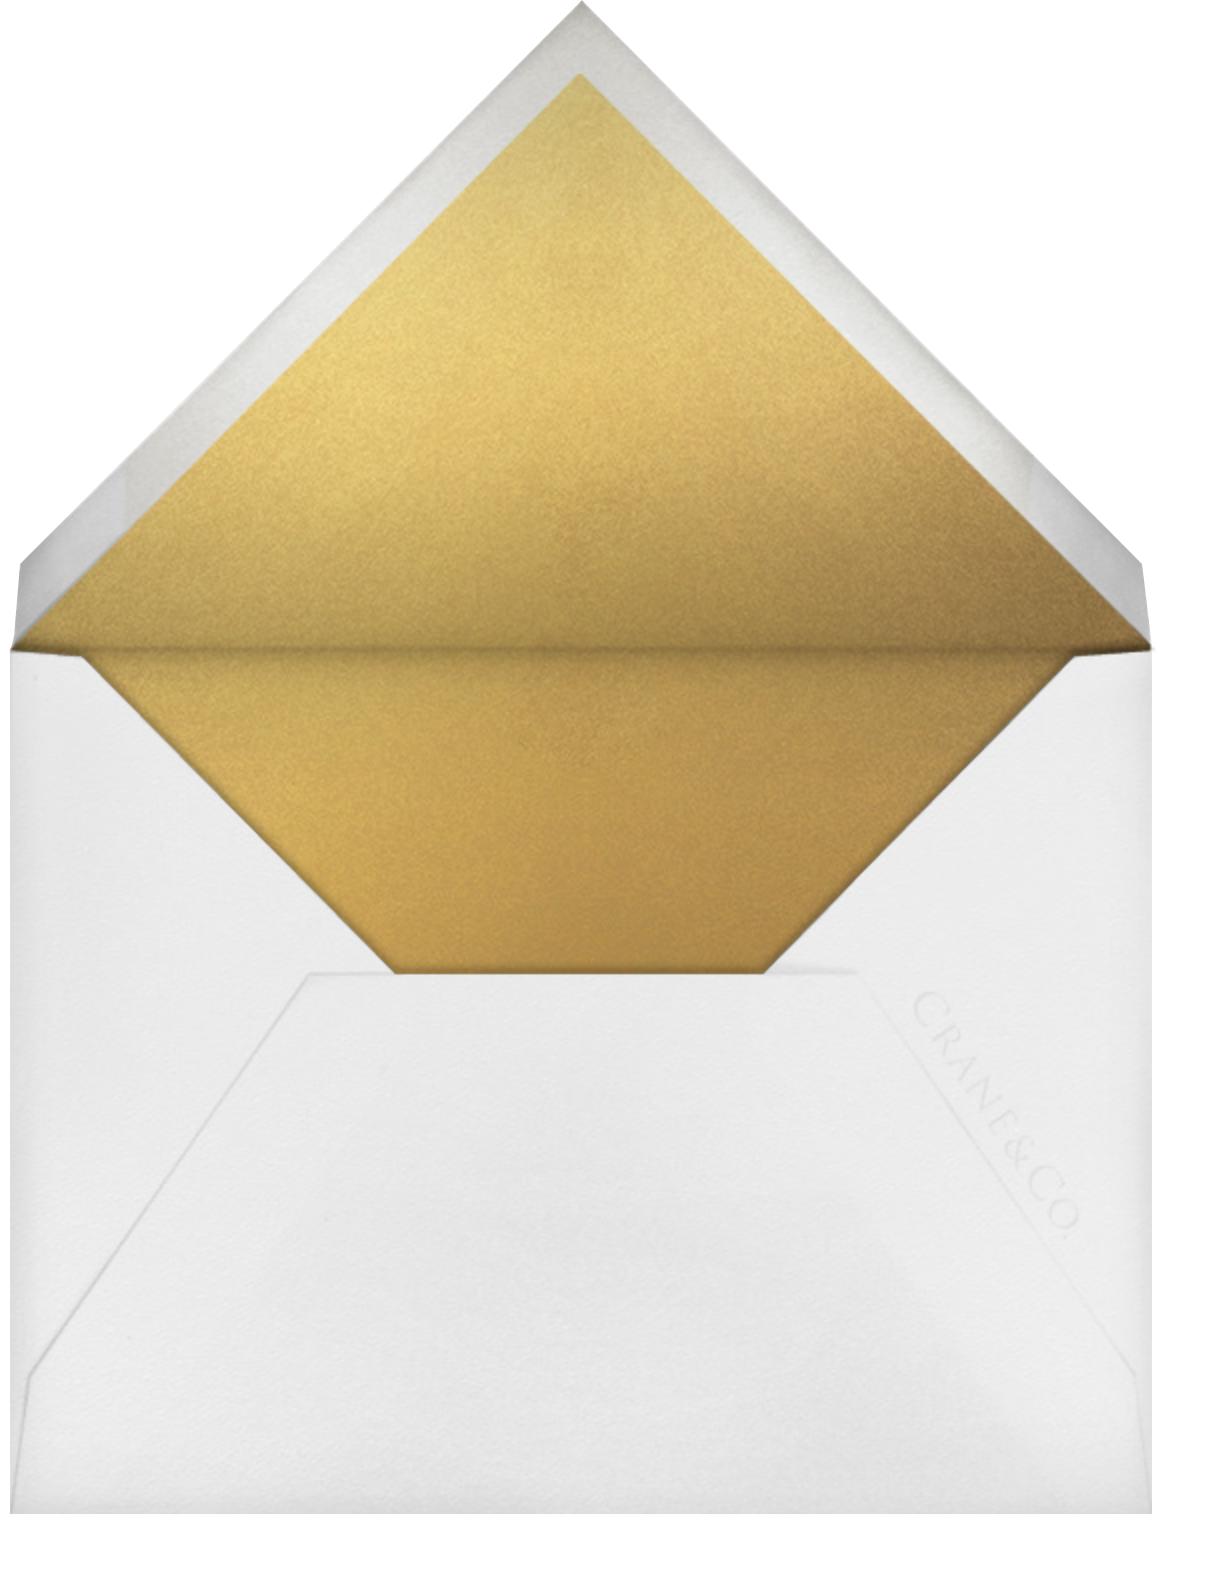 Winter Garden I (Card) - Gold - Paperless Post - Envelope